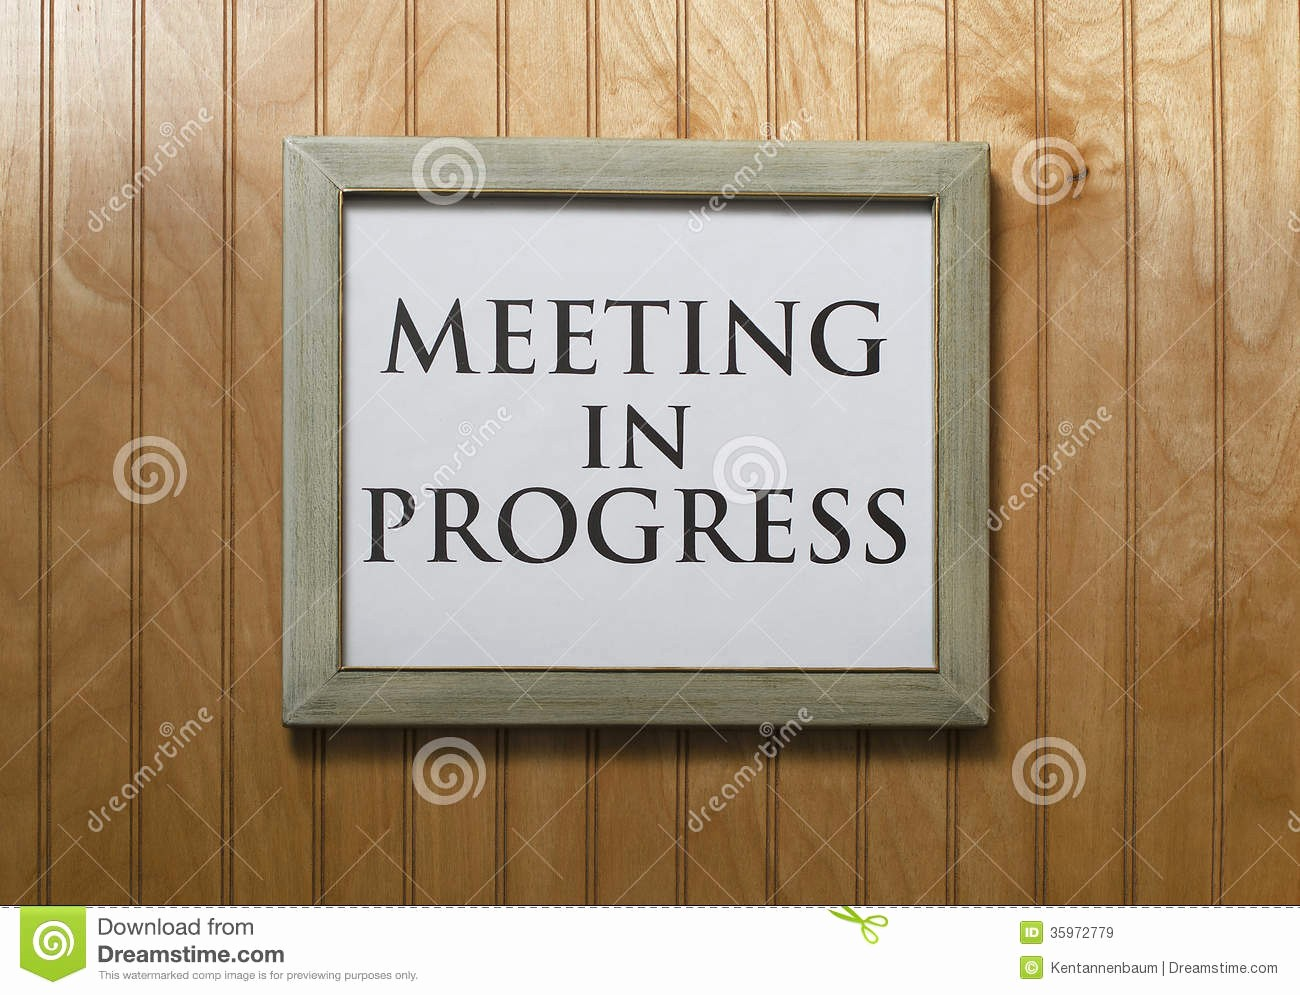 Meeting In Progress Door Signs Awesome Meeting In Progress Sign Stock Image Image Of Problem